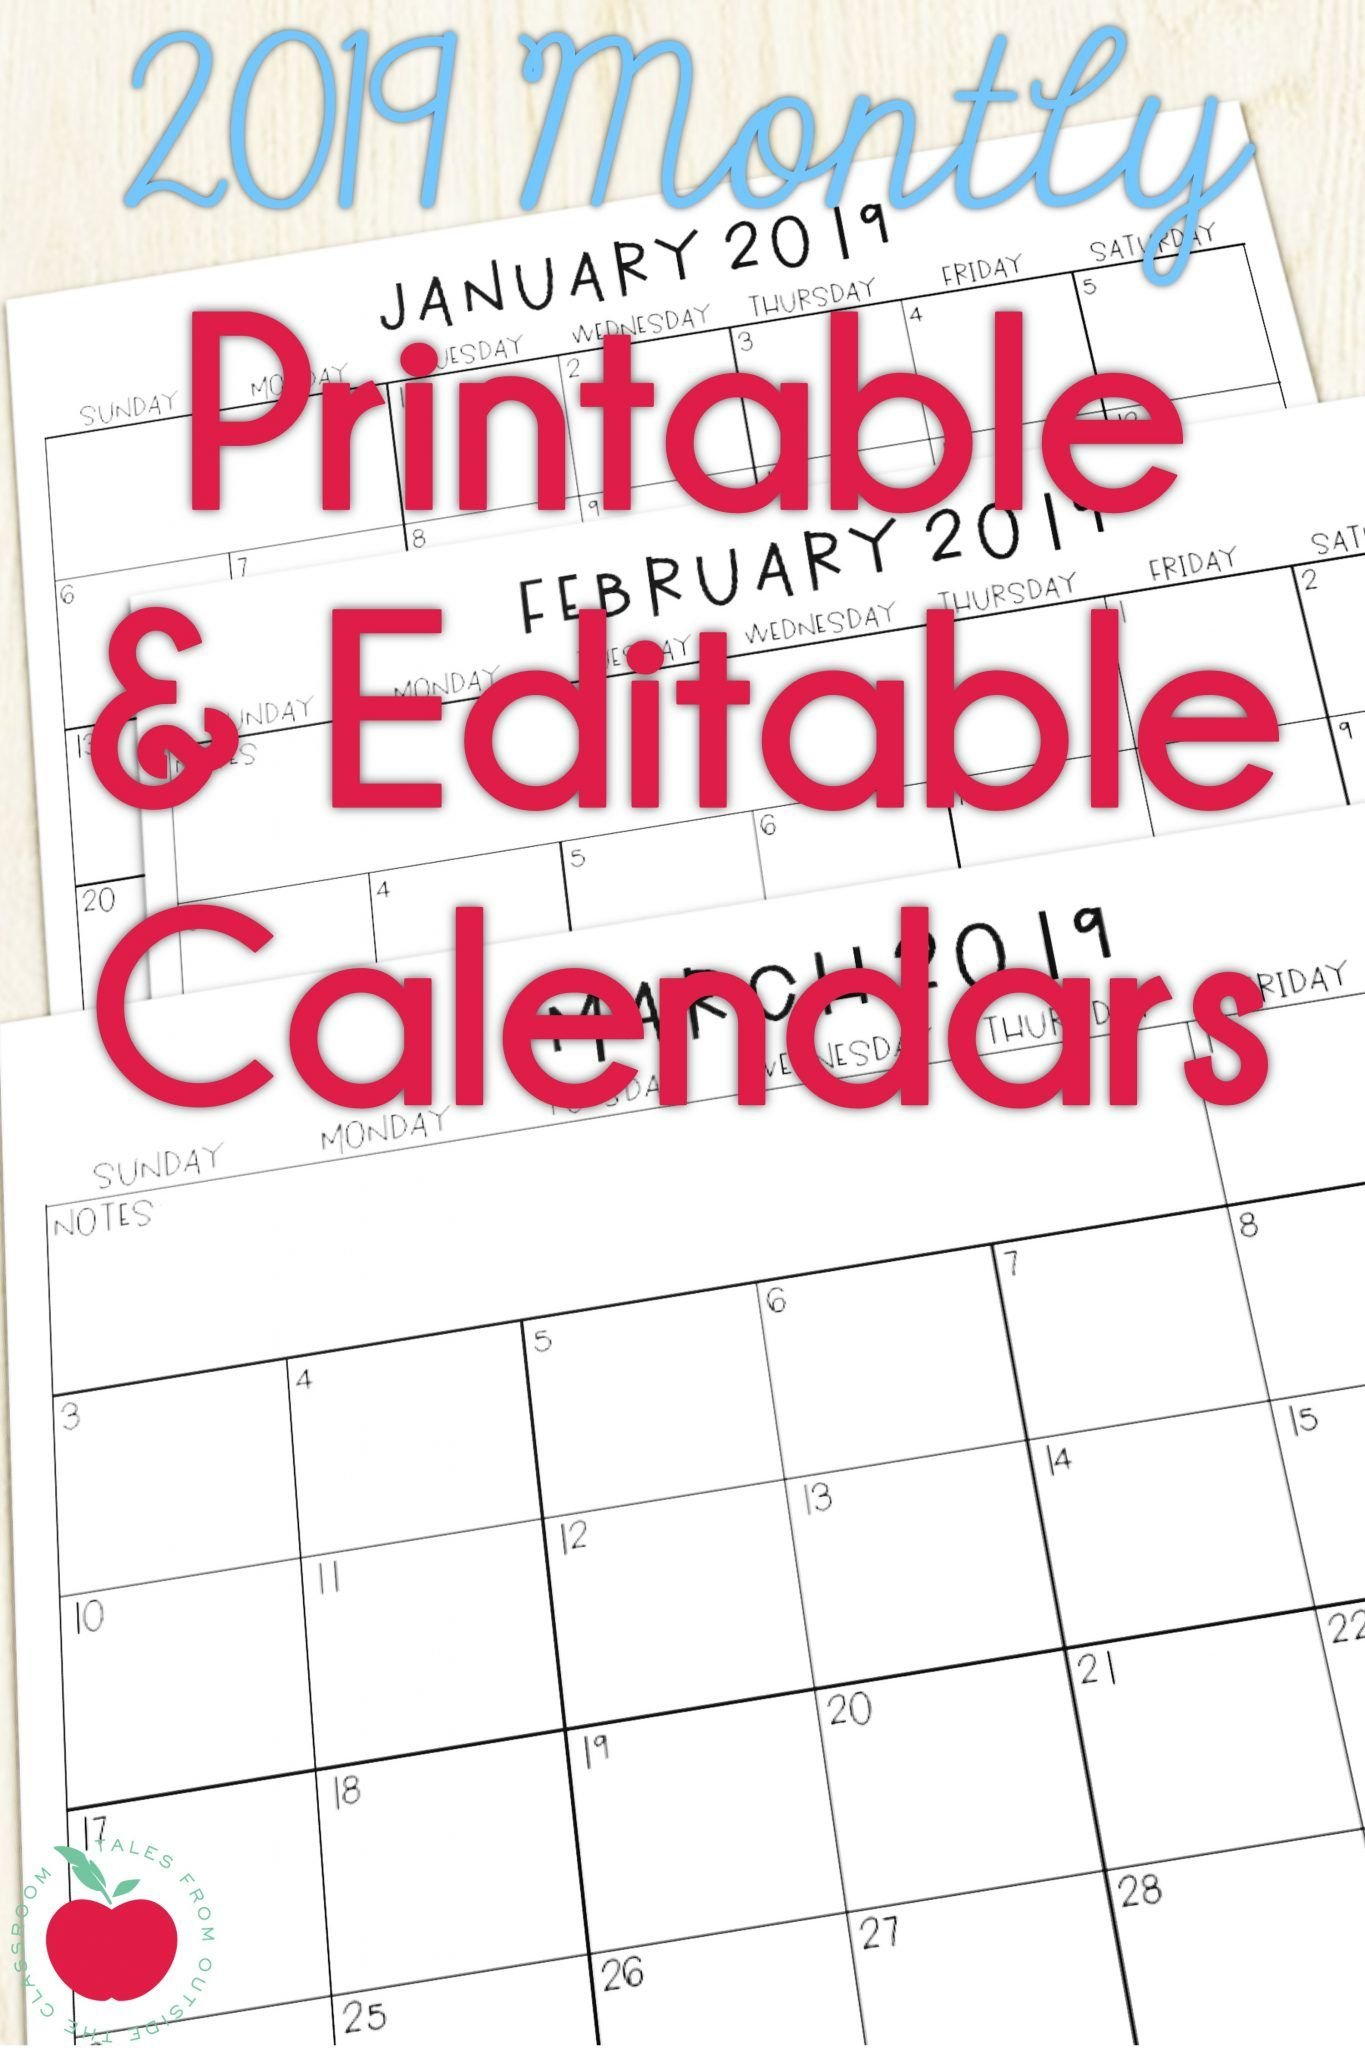 Blank Preschool Class Calendar | Example Calendar Printable Free Editable Preschool Calendar Template